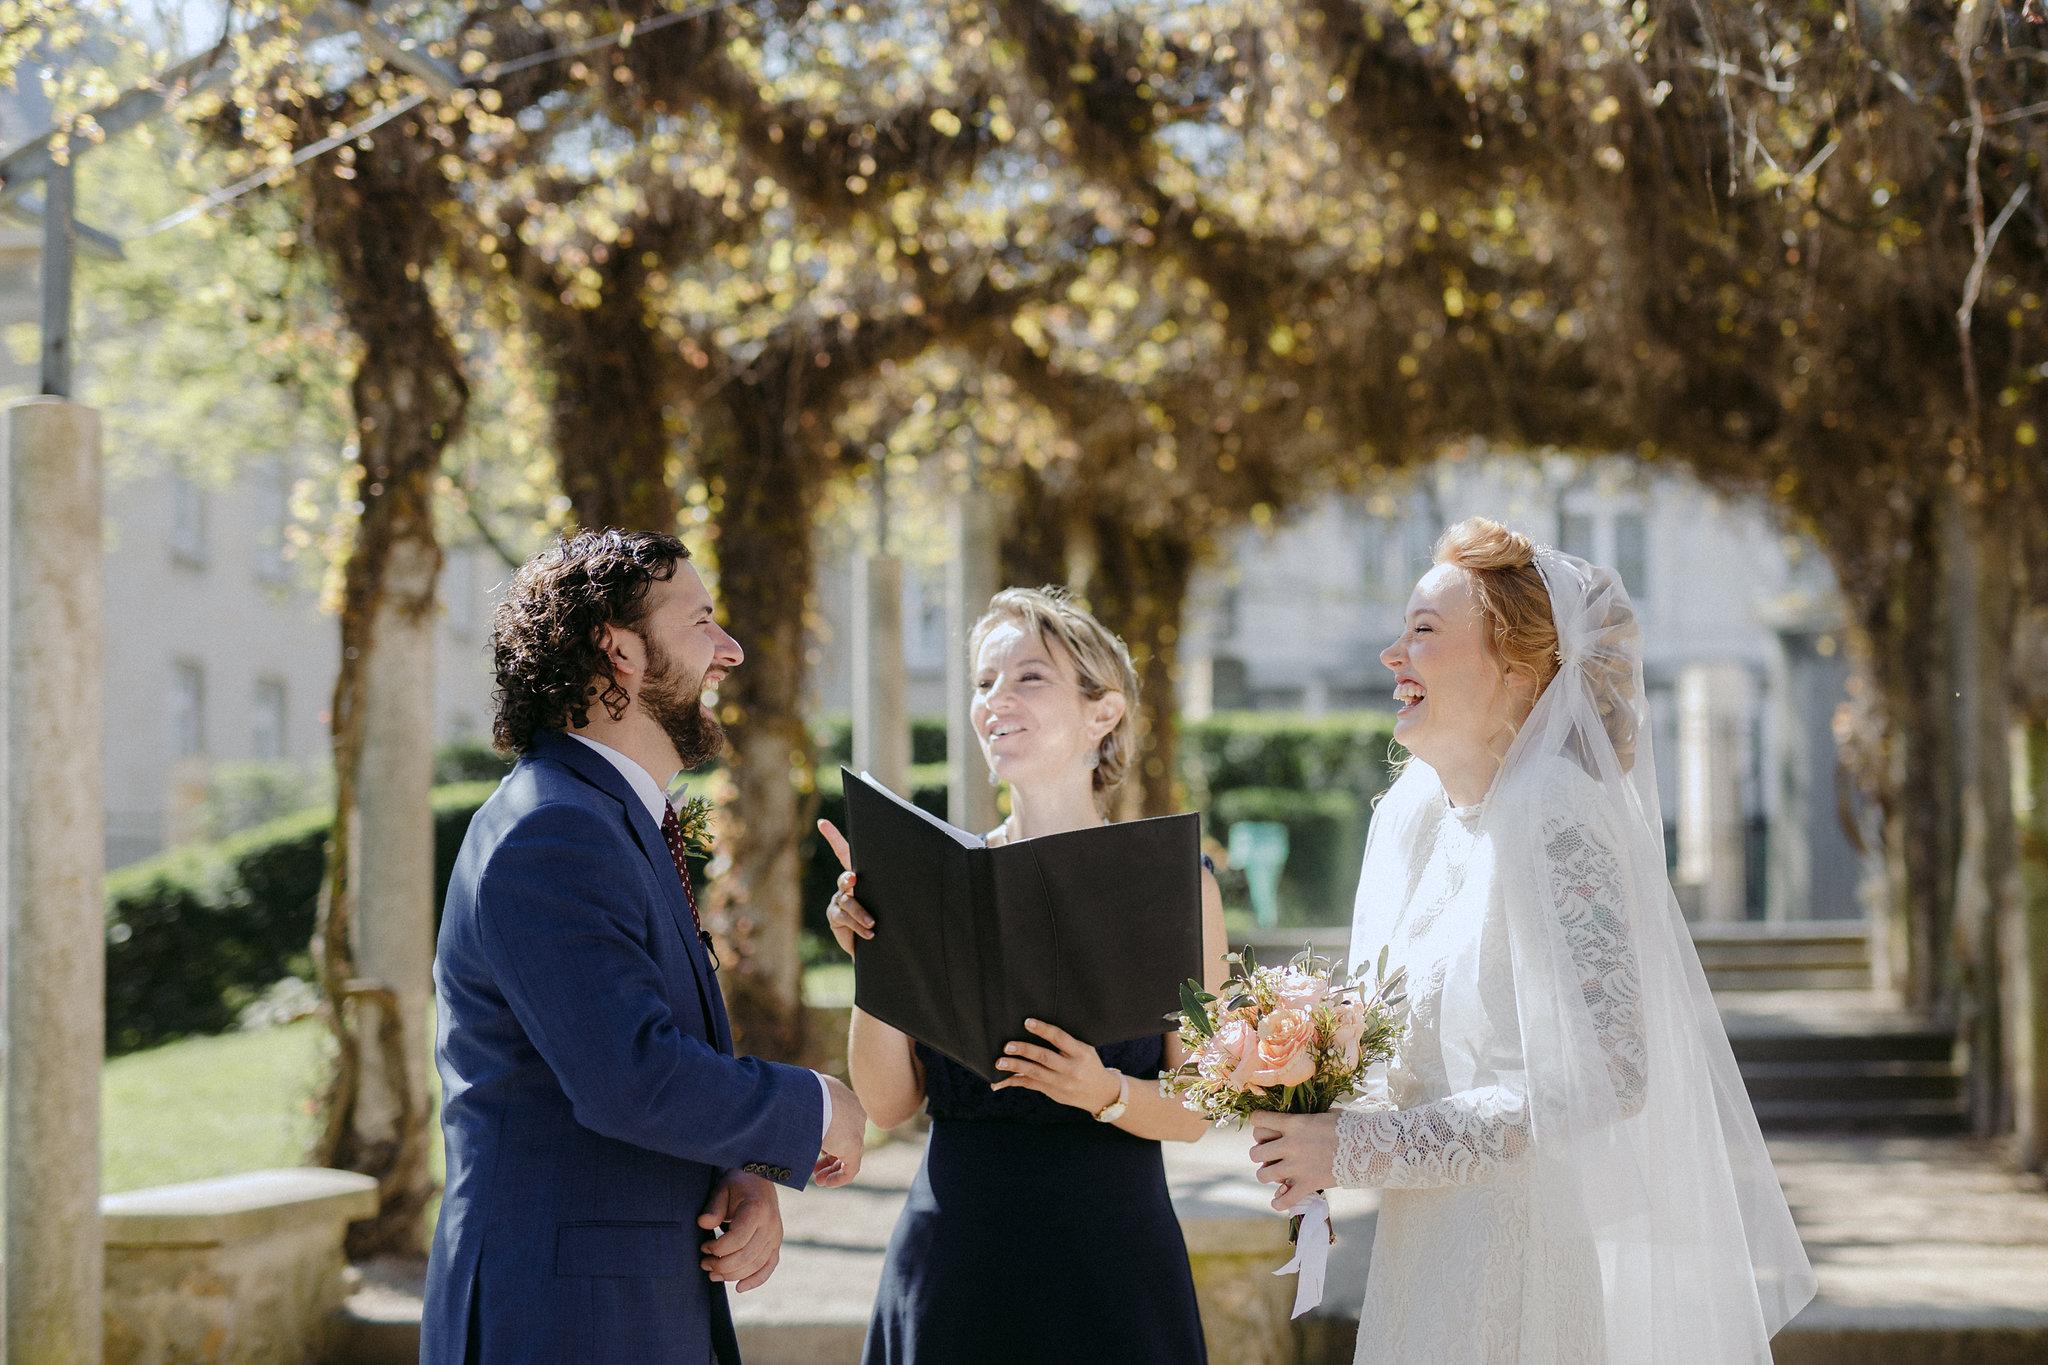 Paris_elopement_wedding_photographer-173.jpg